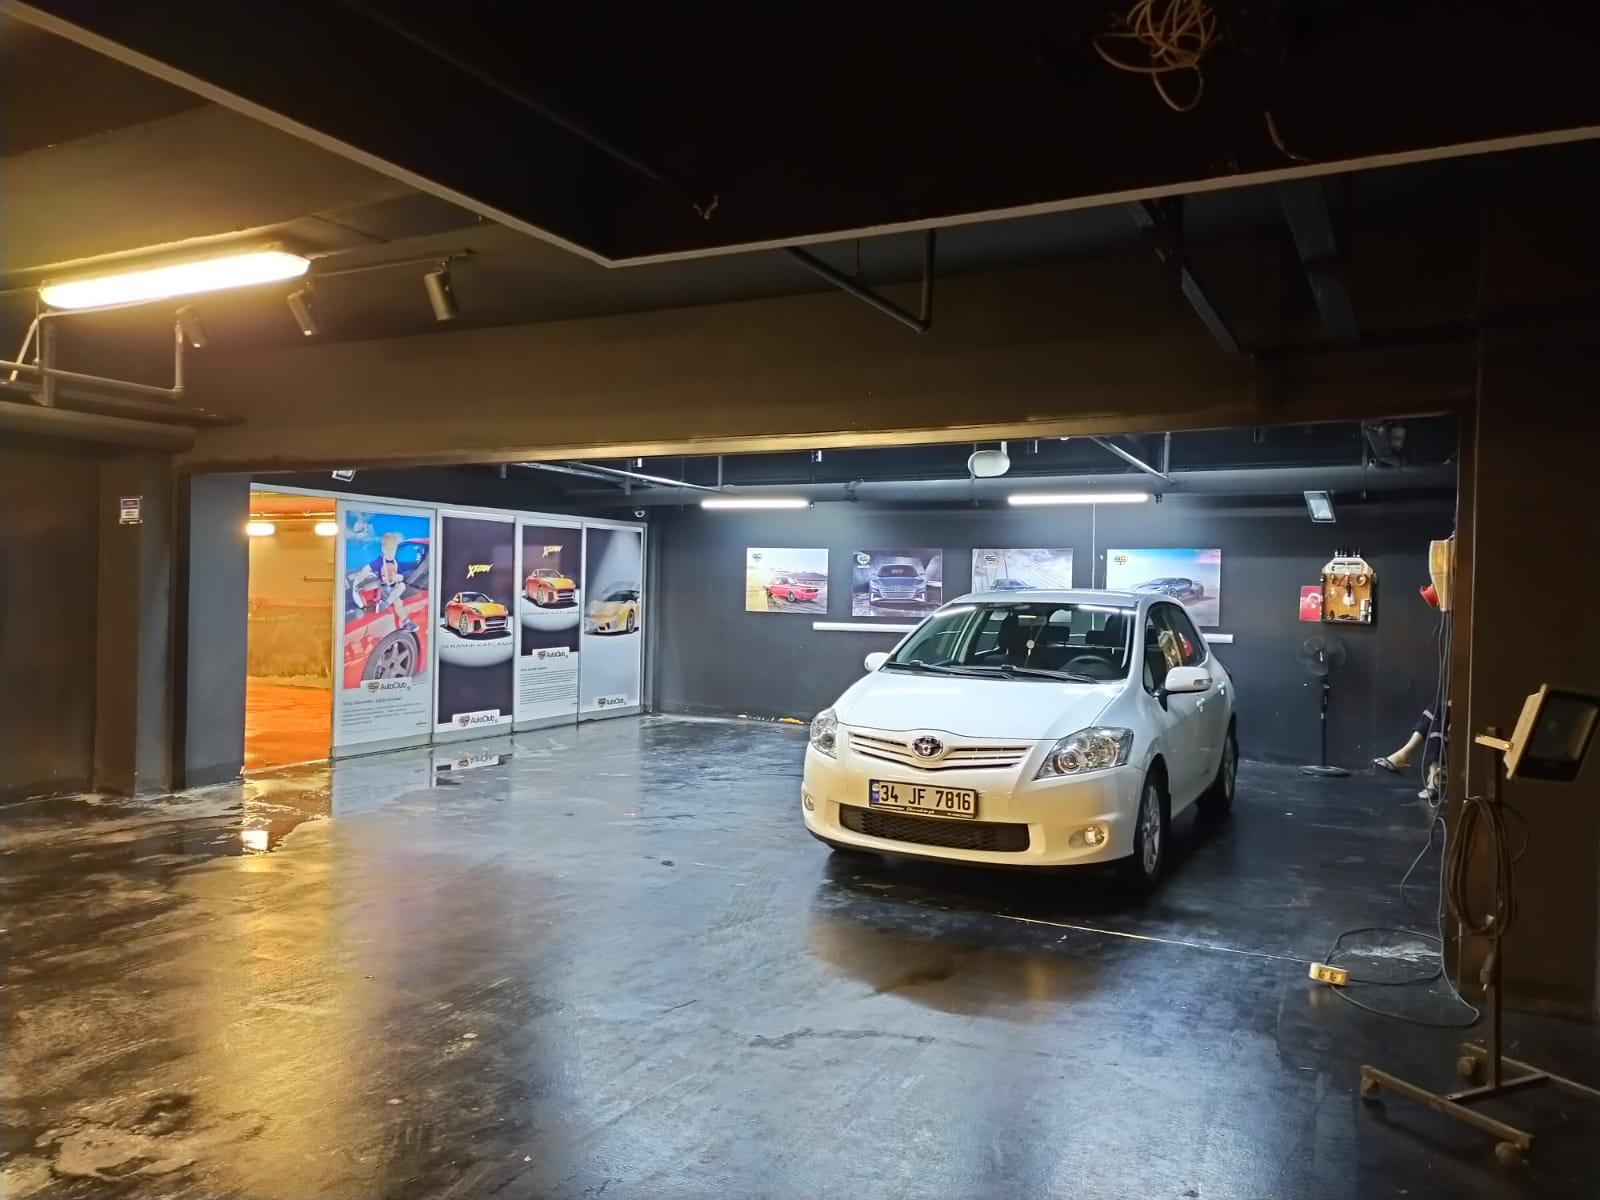 AutoClub Ritim - İstanbul Maltepe